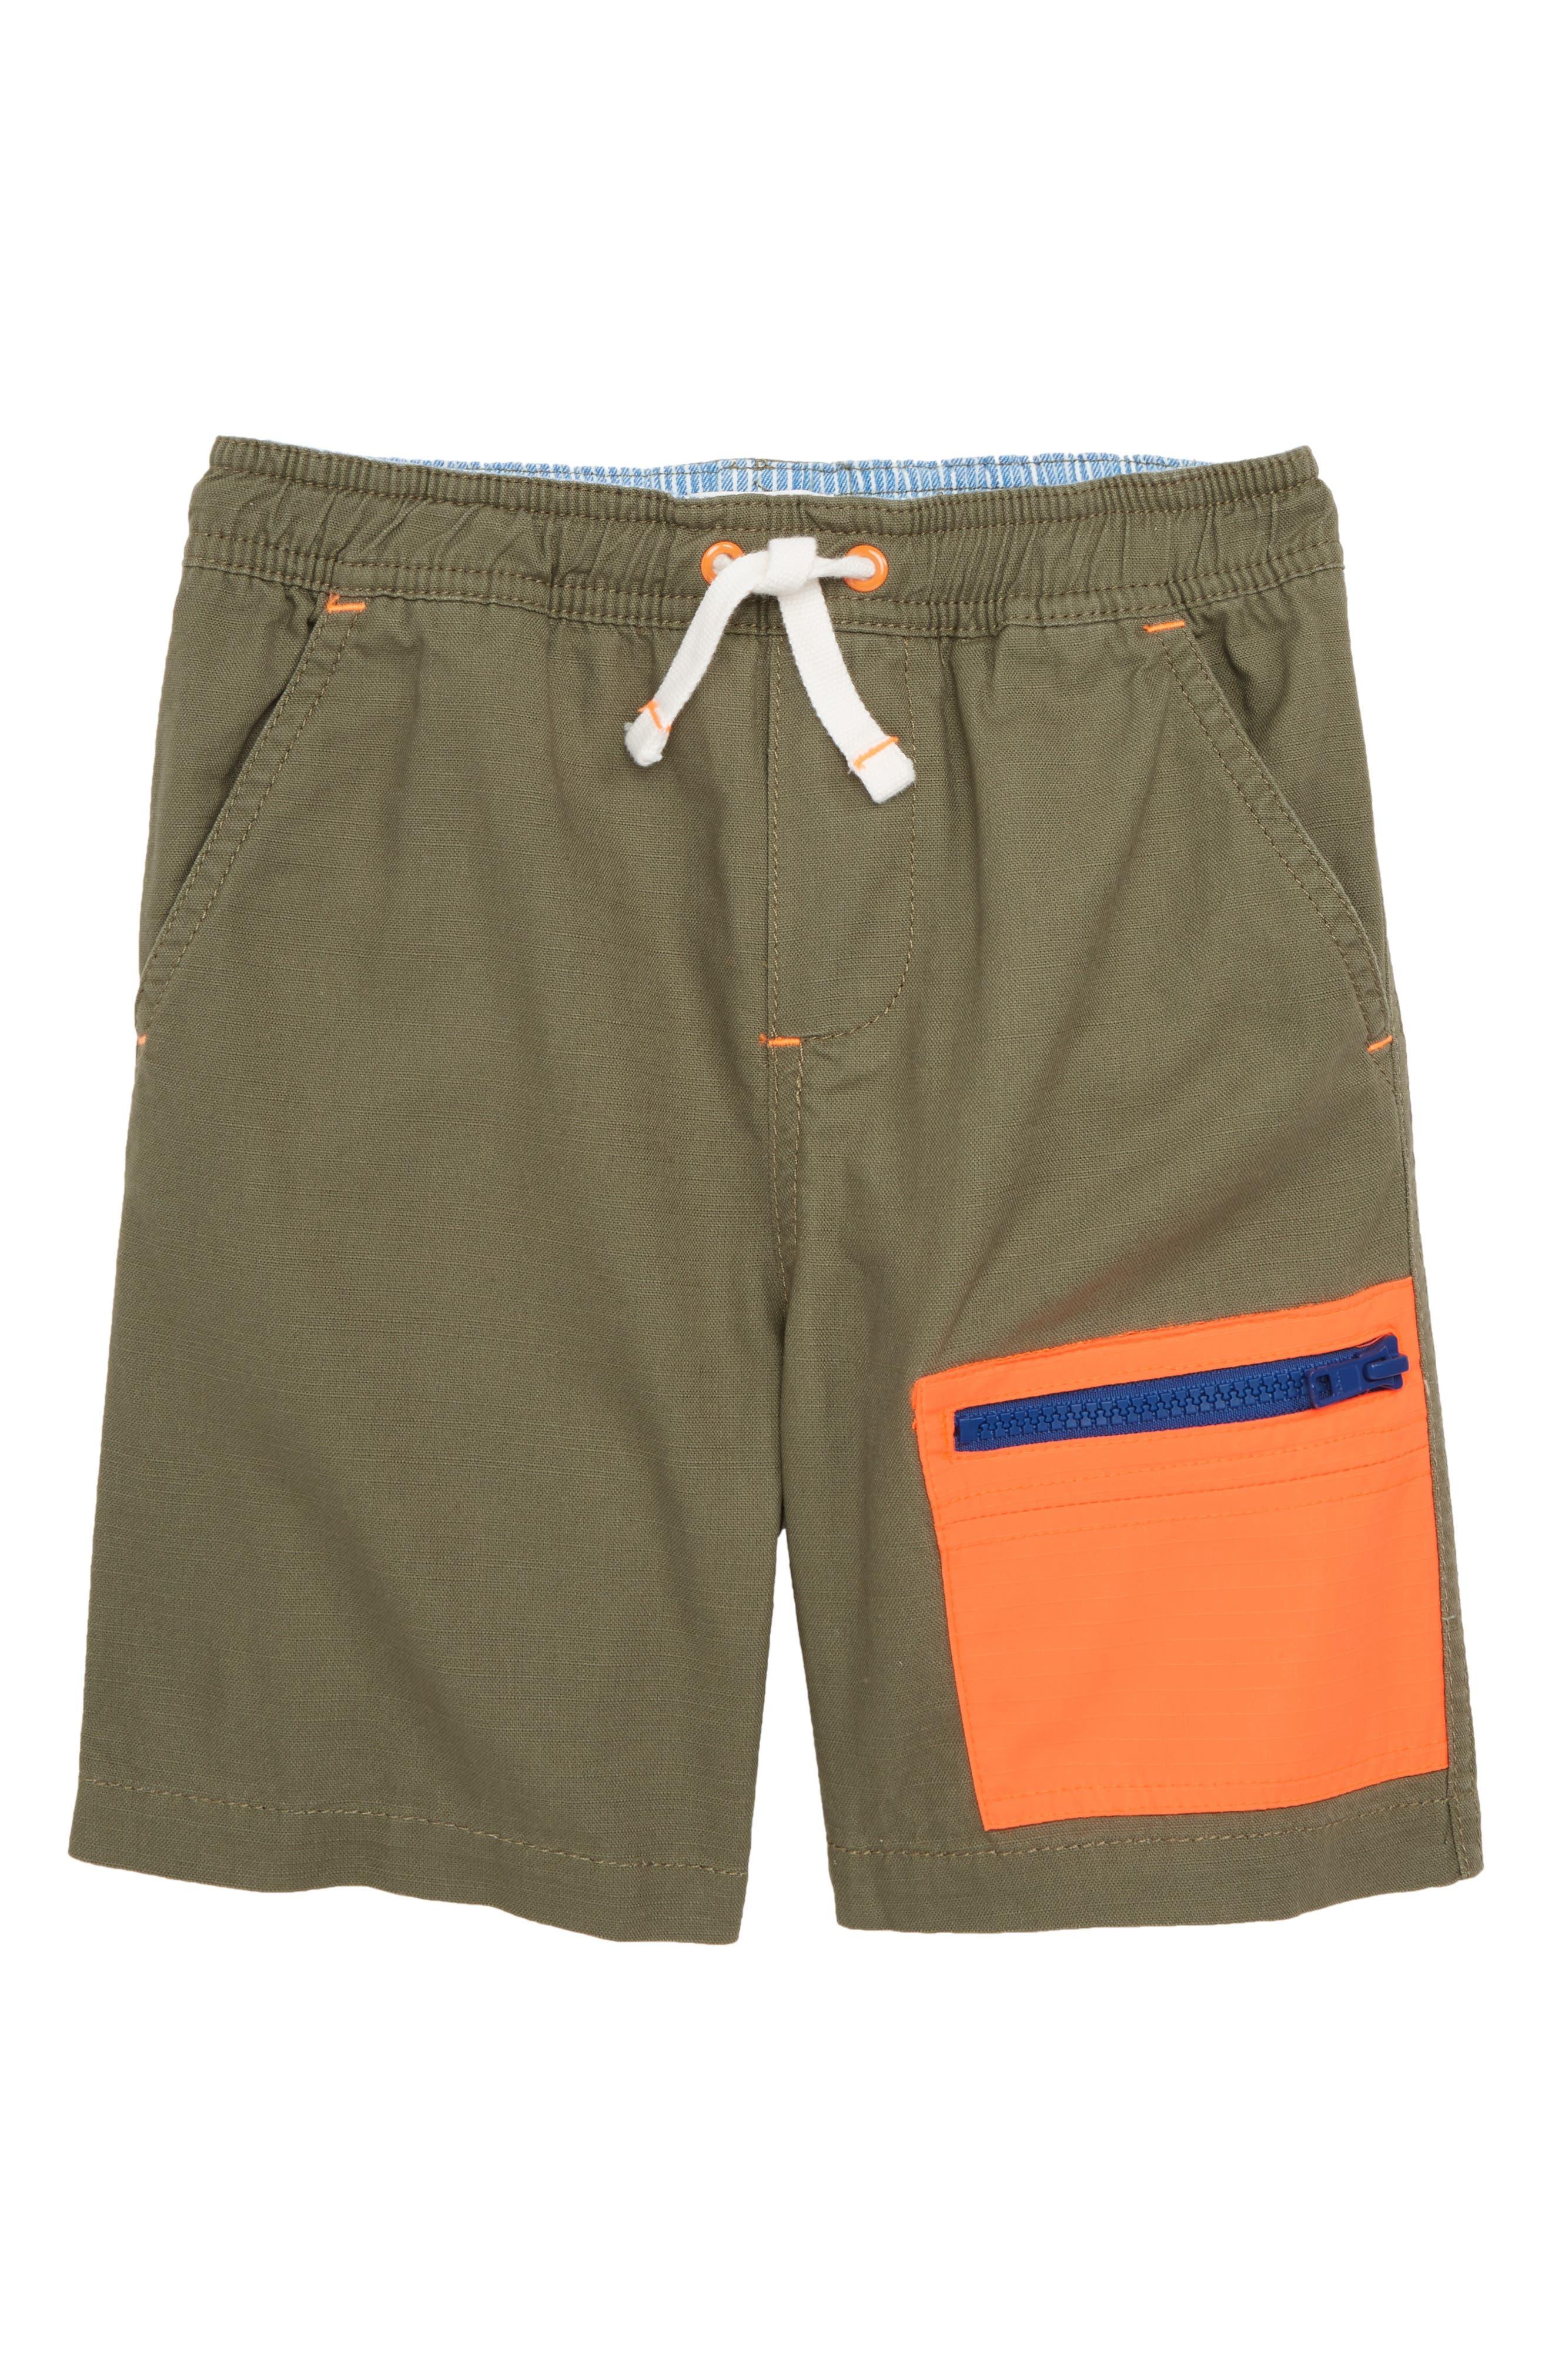 Colorblock Shorts,                         Main,                         color, Khaki Green